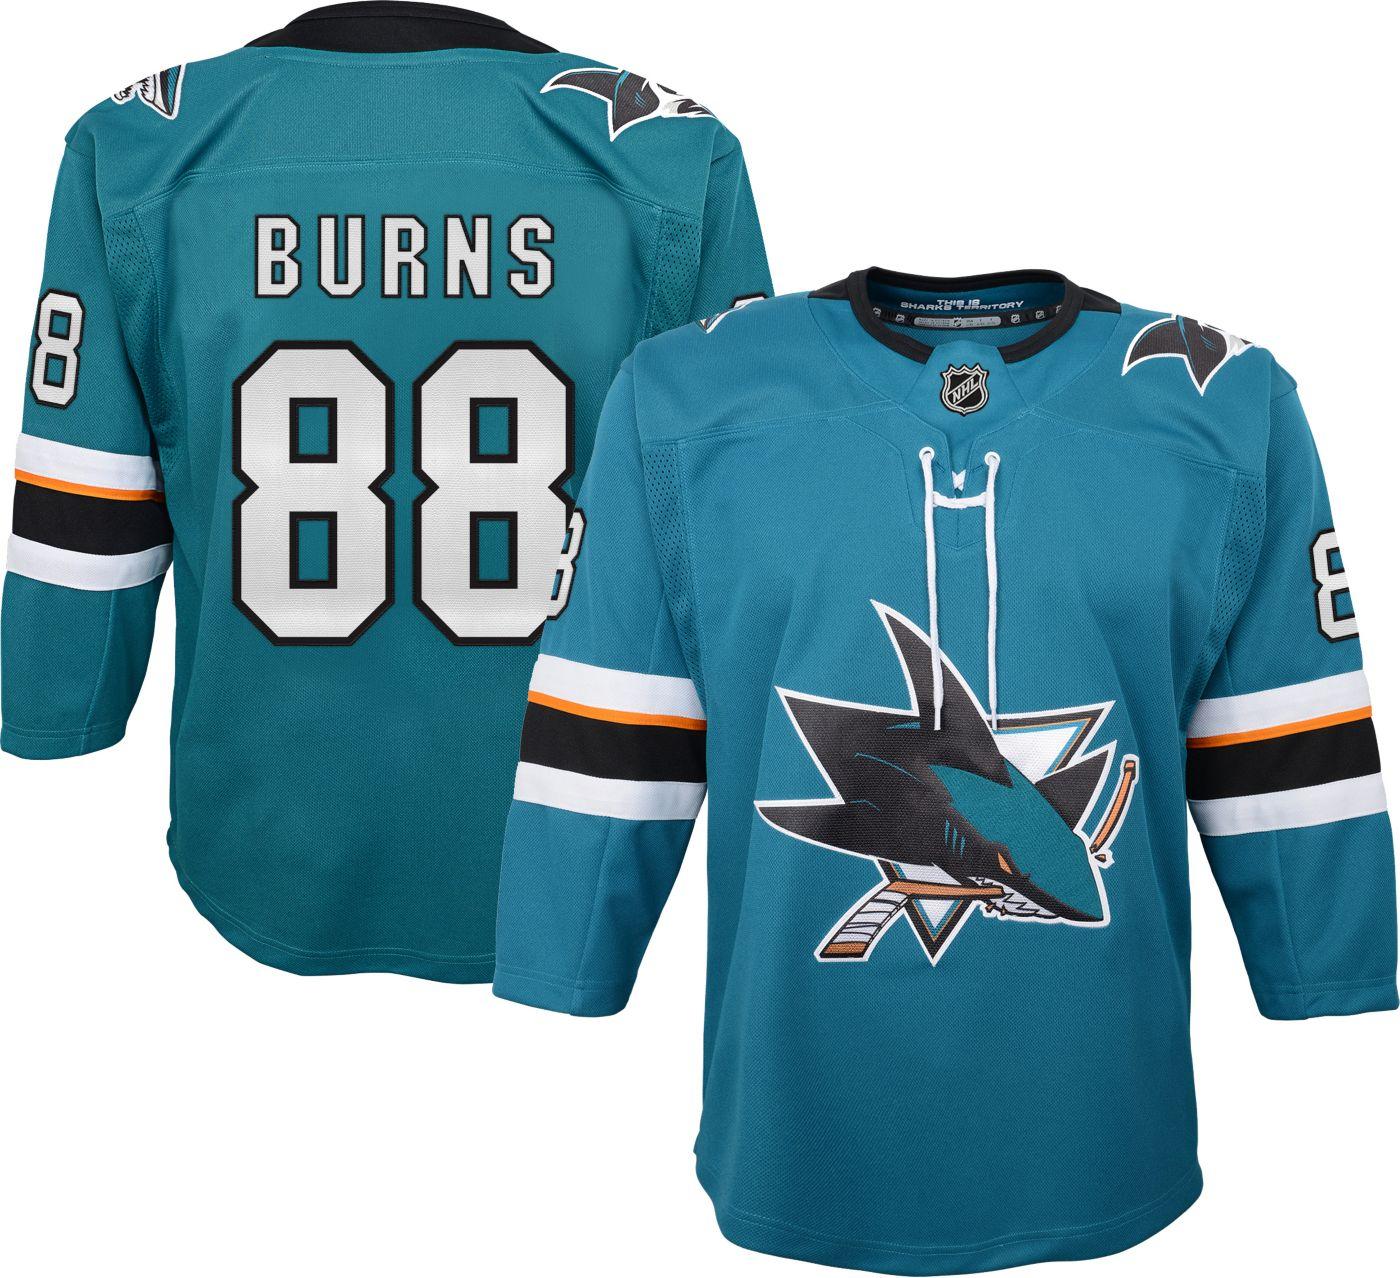 NHL Youth San Jose Sharks Brent Burns #88 Premier Home Jersey